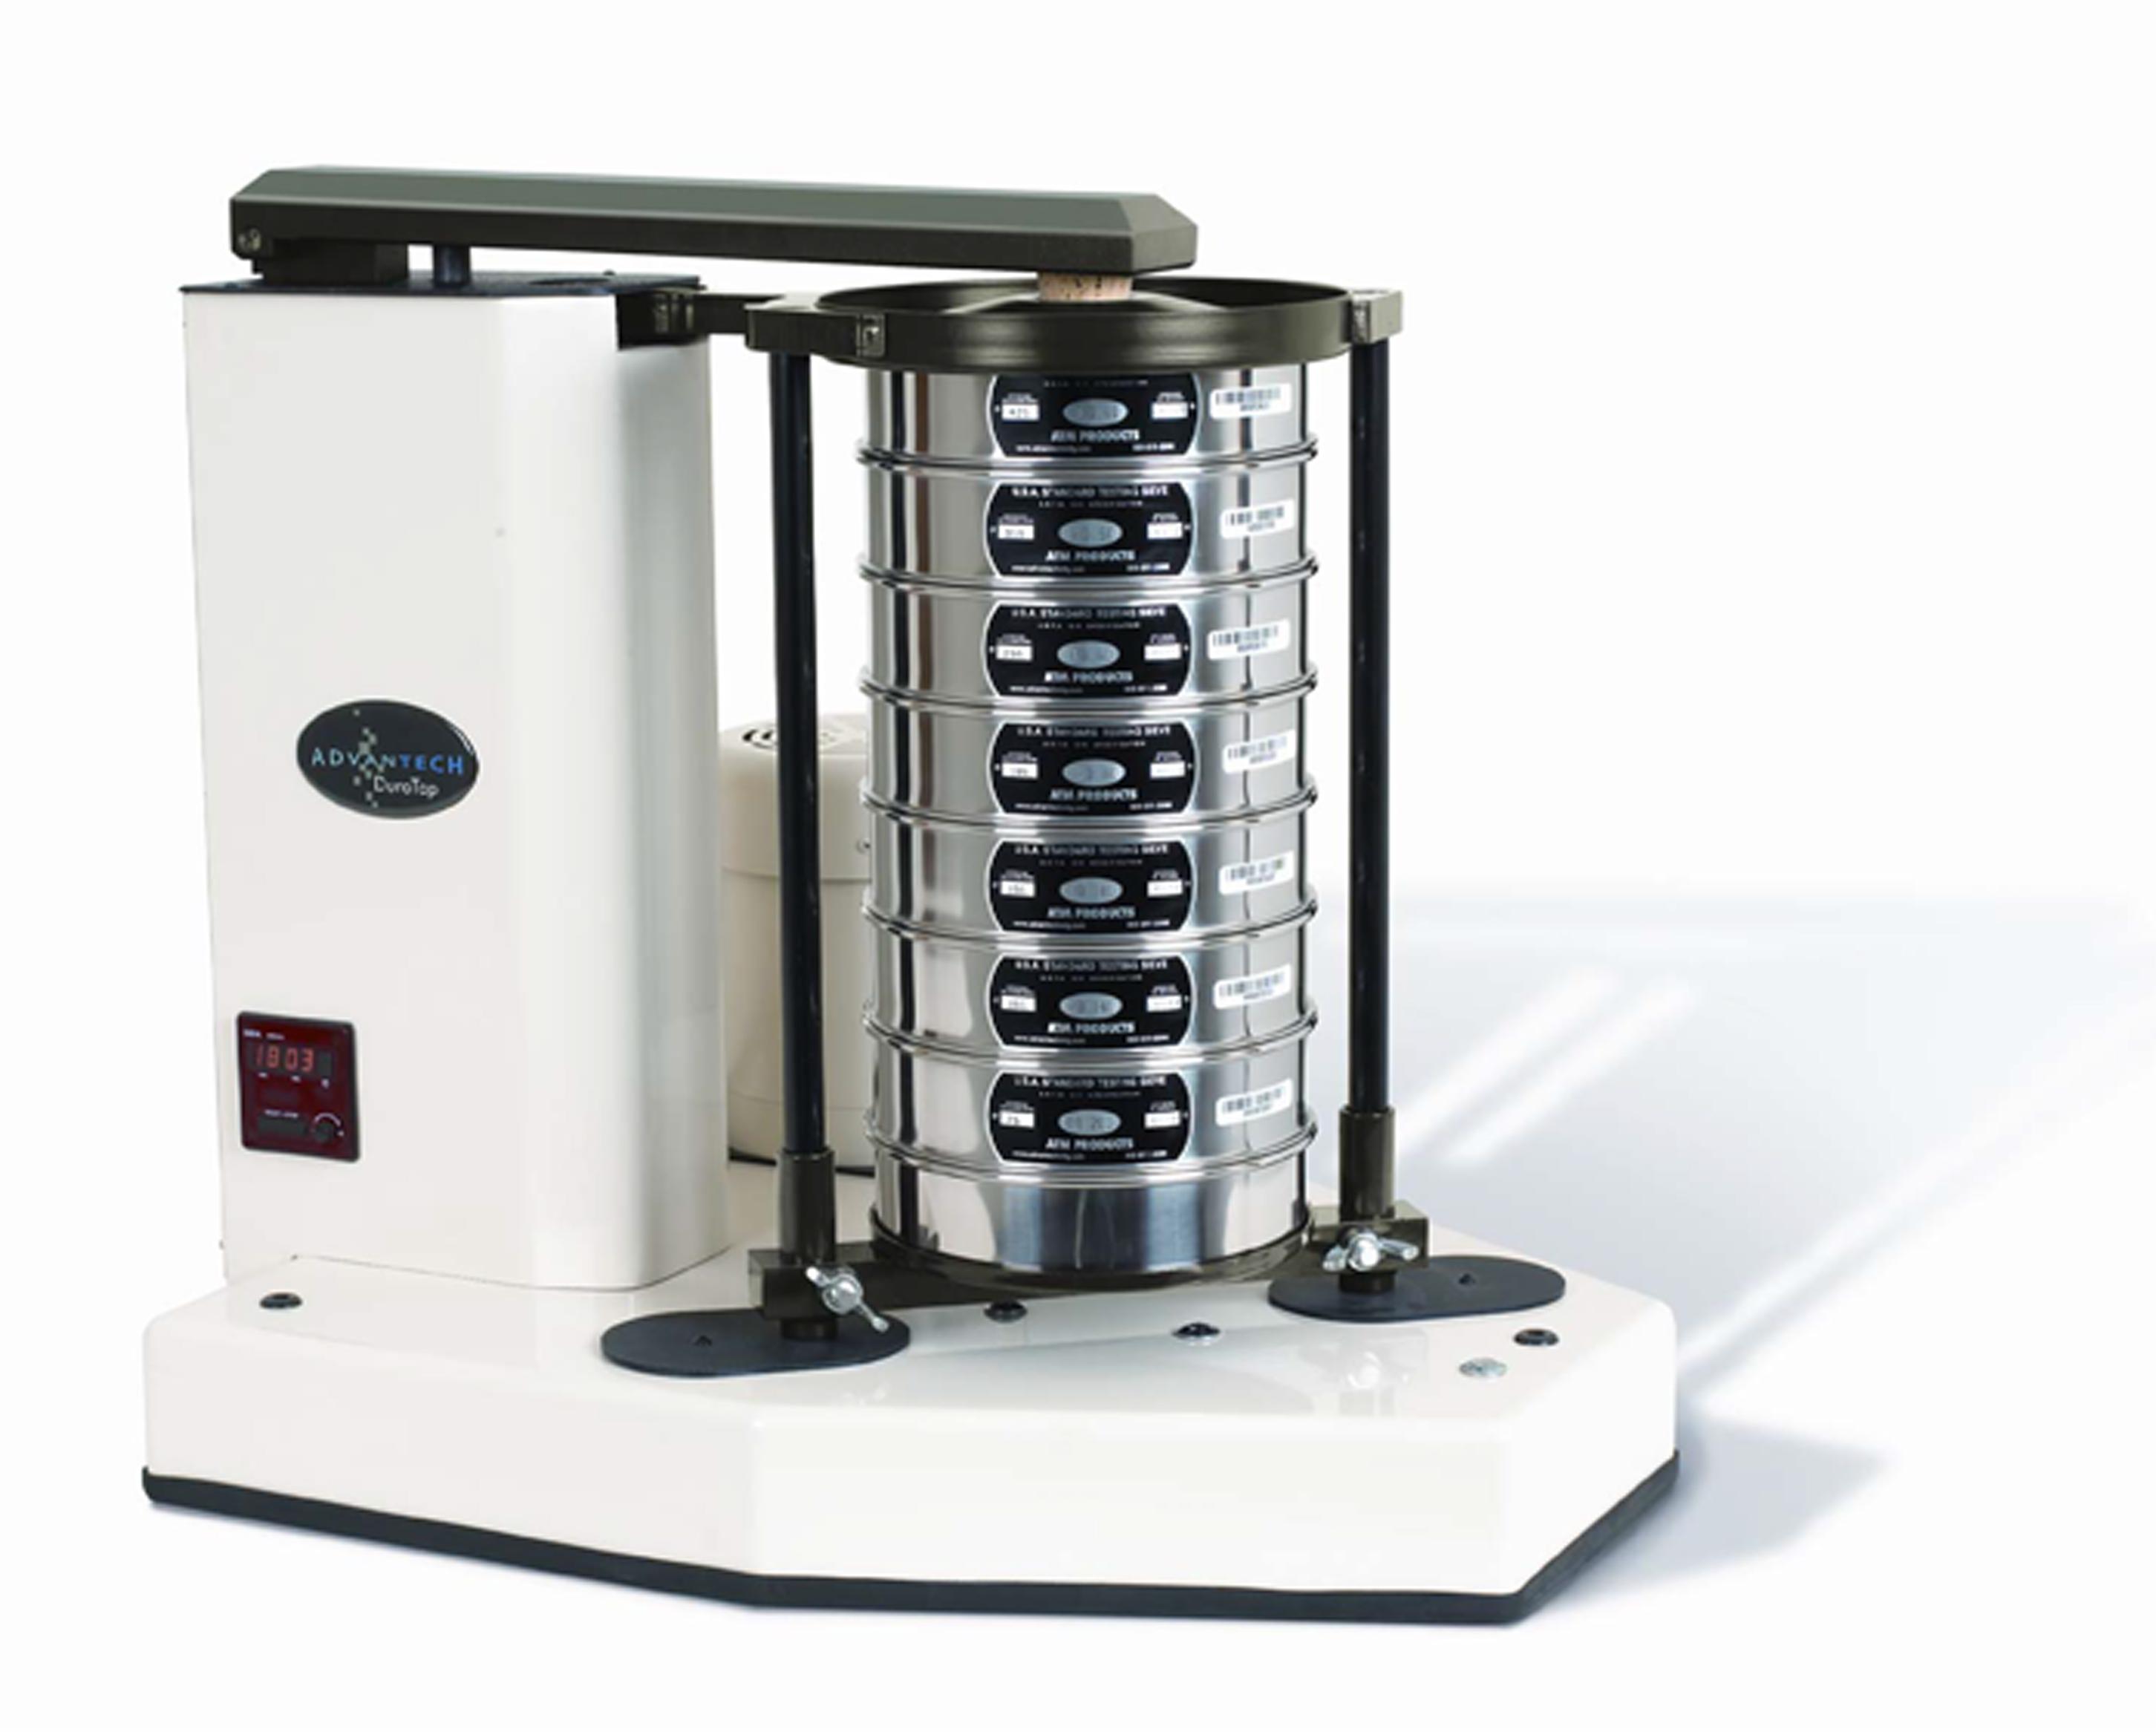 DuraTap Sieve Shaker